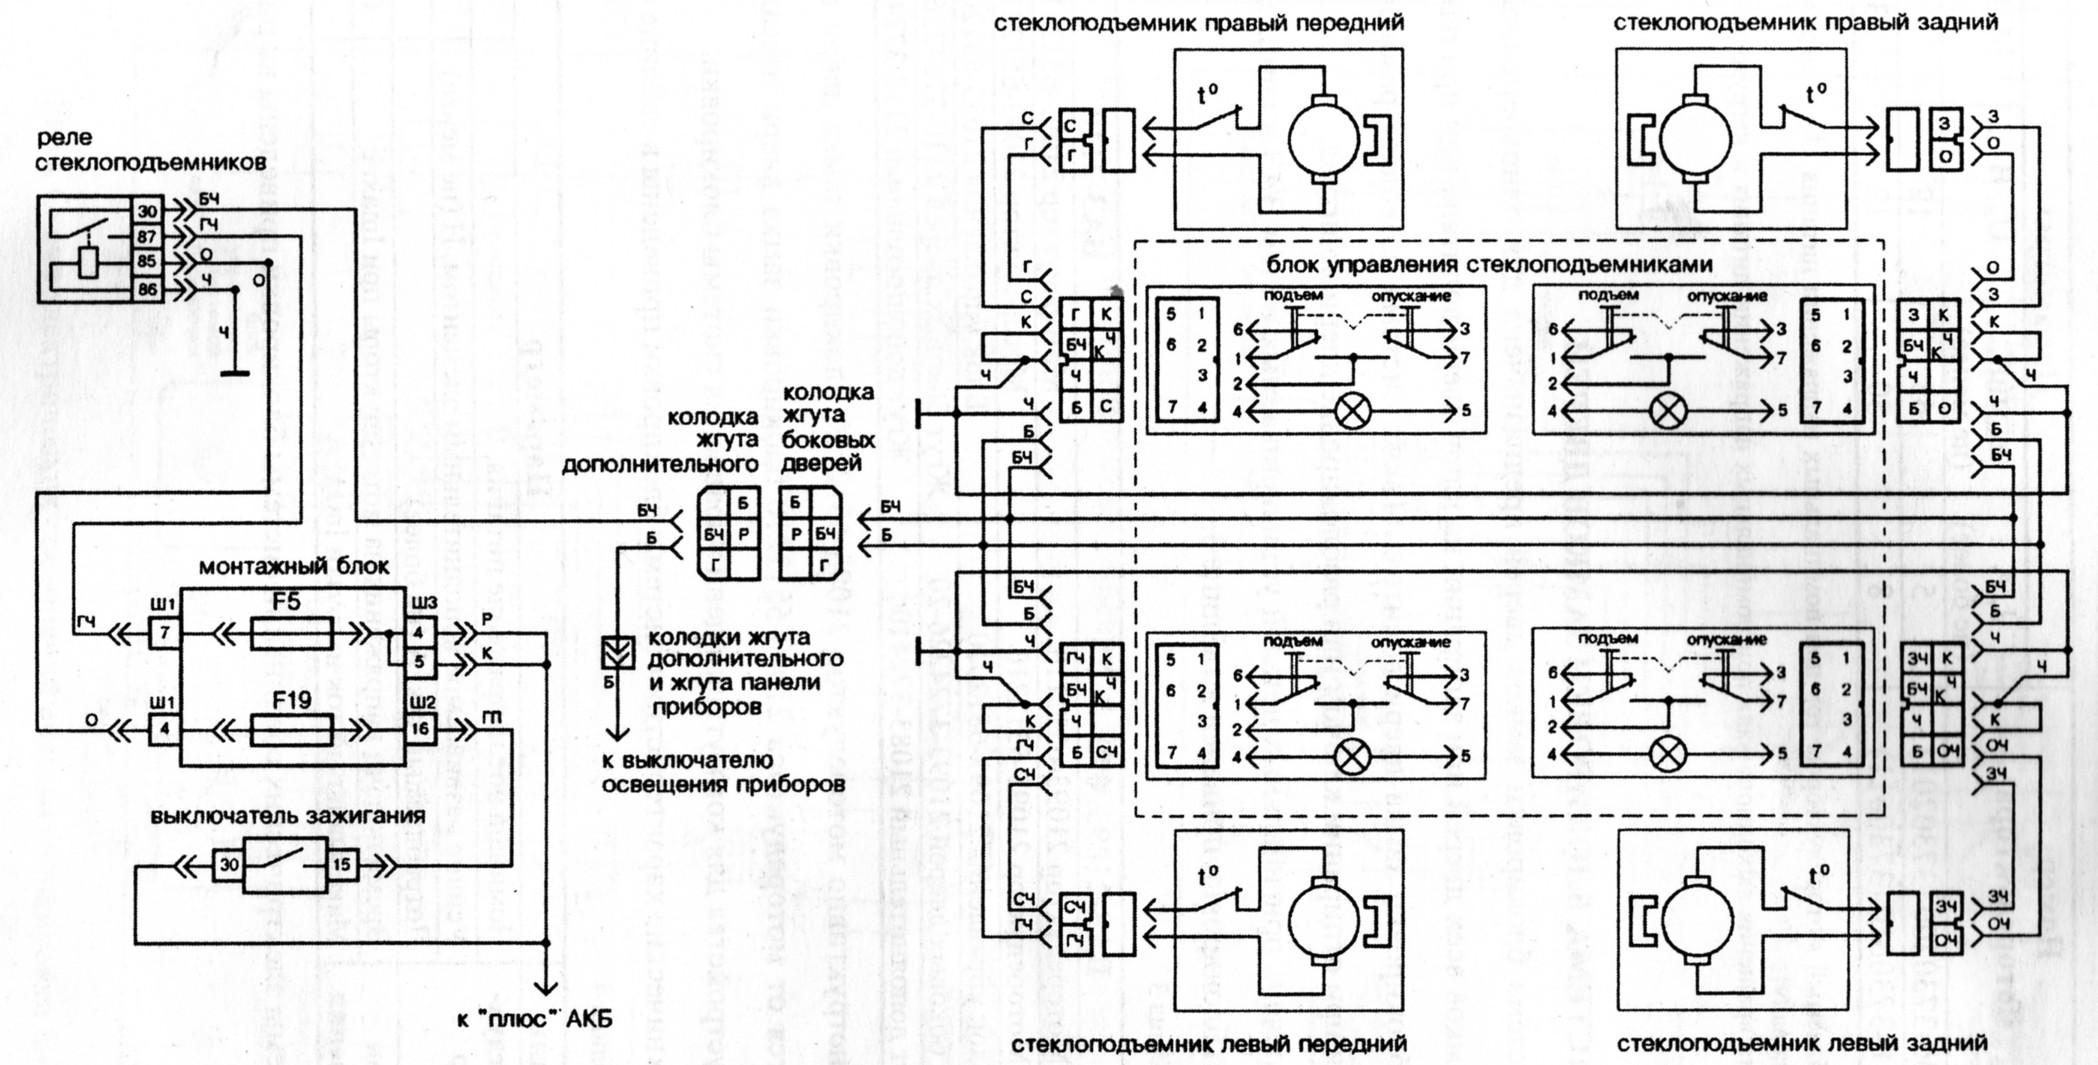 Установка электростеклоподъемников на ваз 2110.